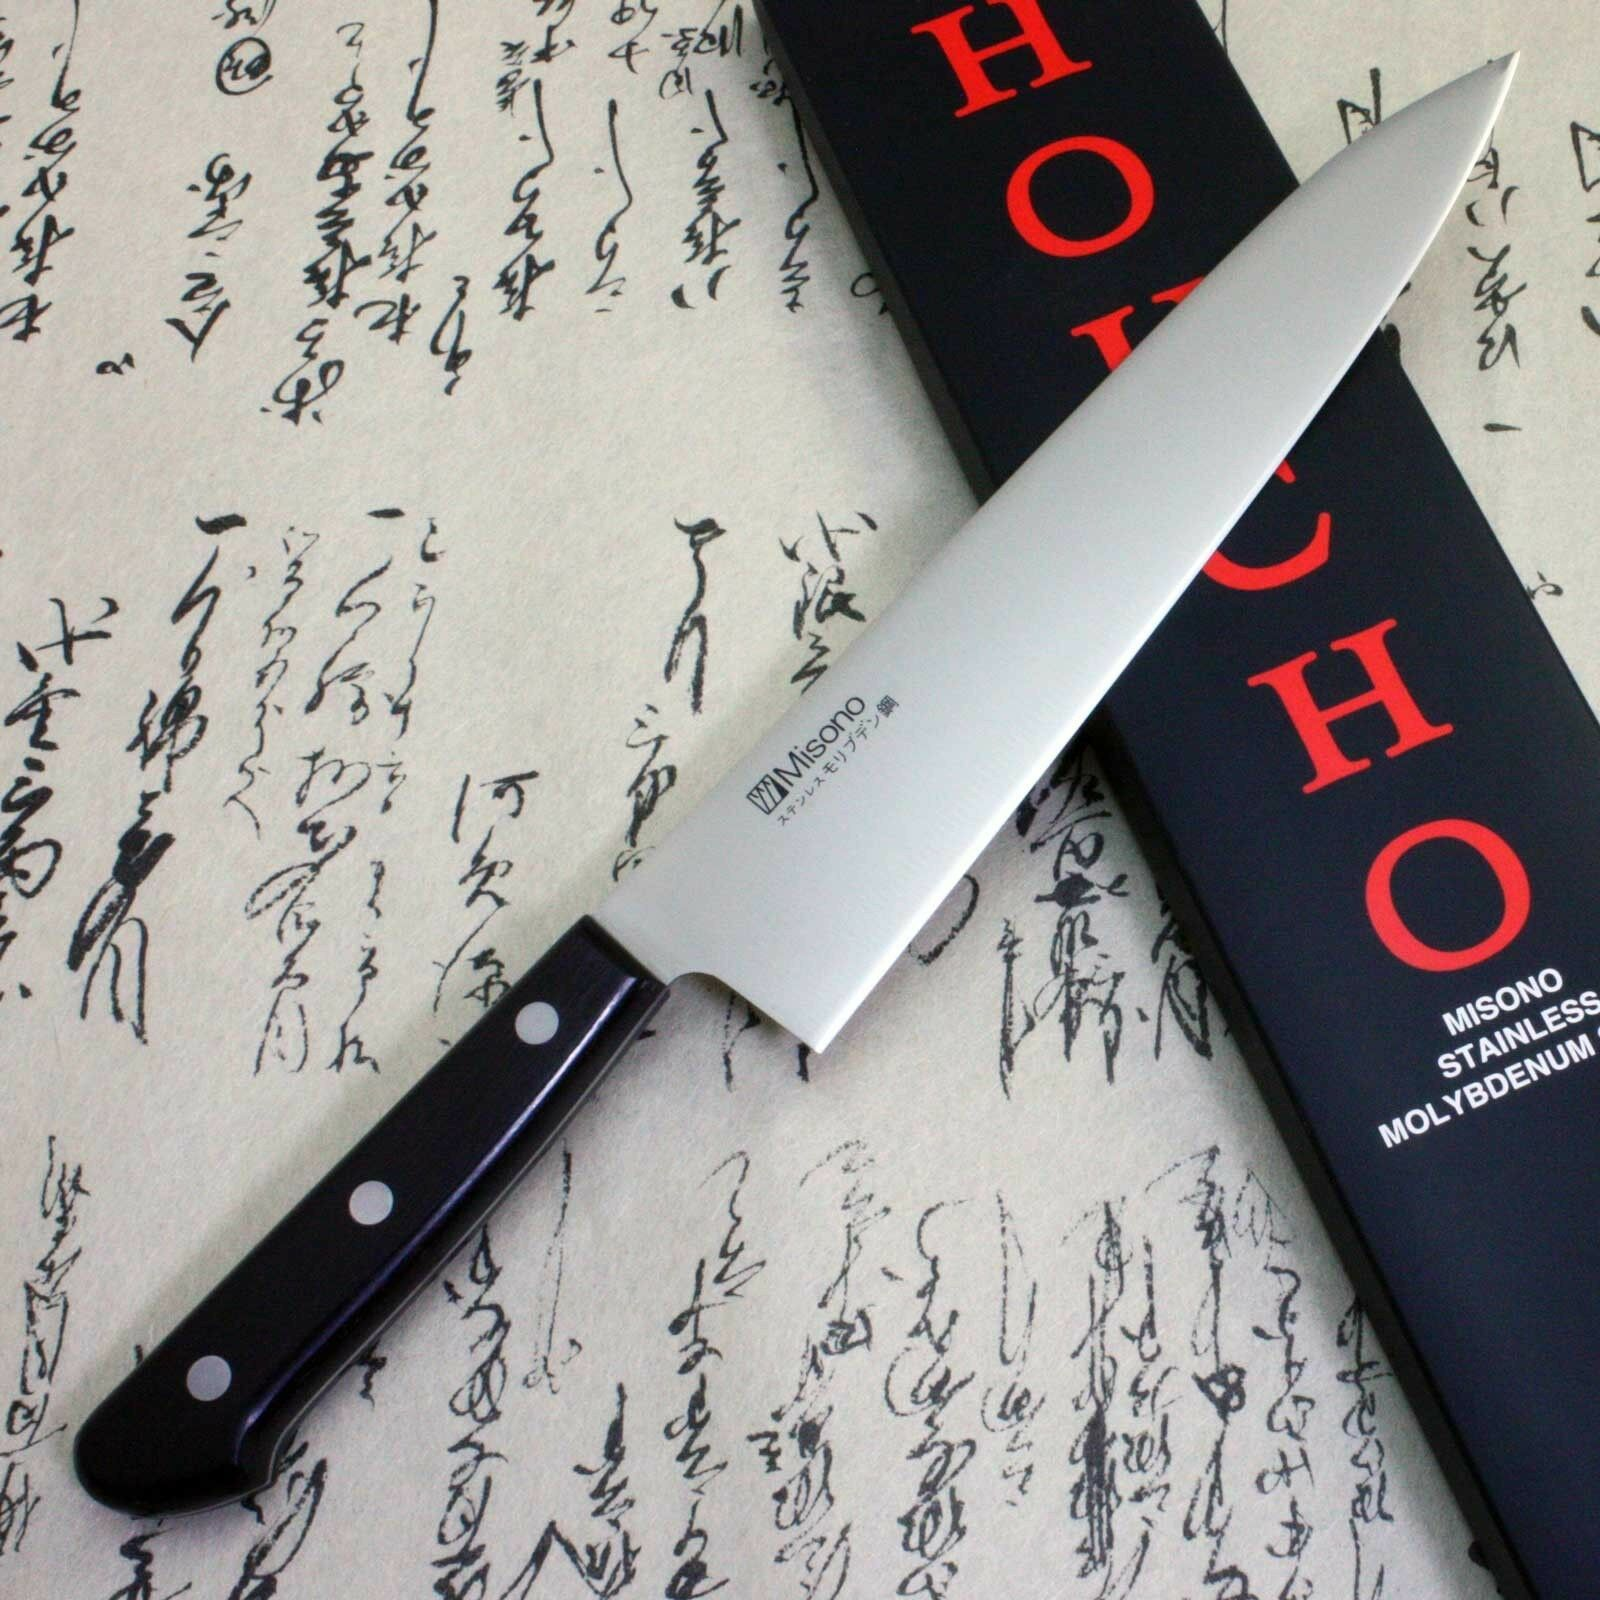 Misono Japanese Chef Kitchen Knife Stainless Molybdenum Gyuto 210mm F S  612